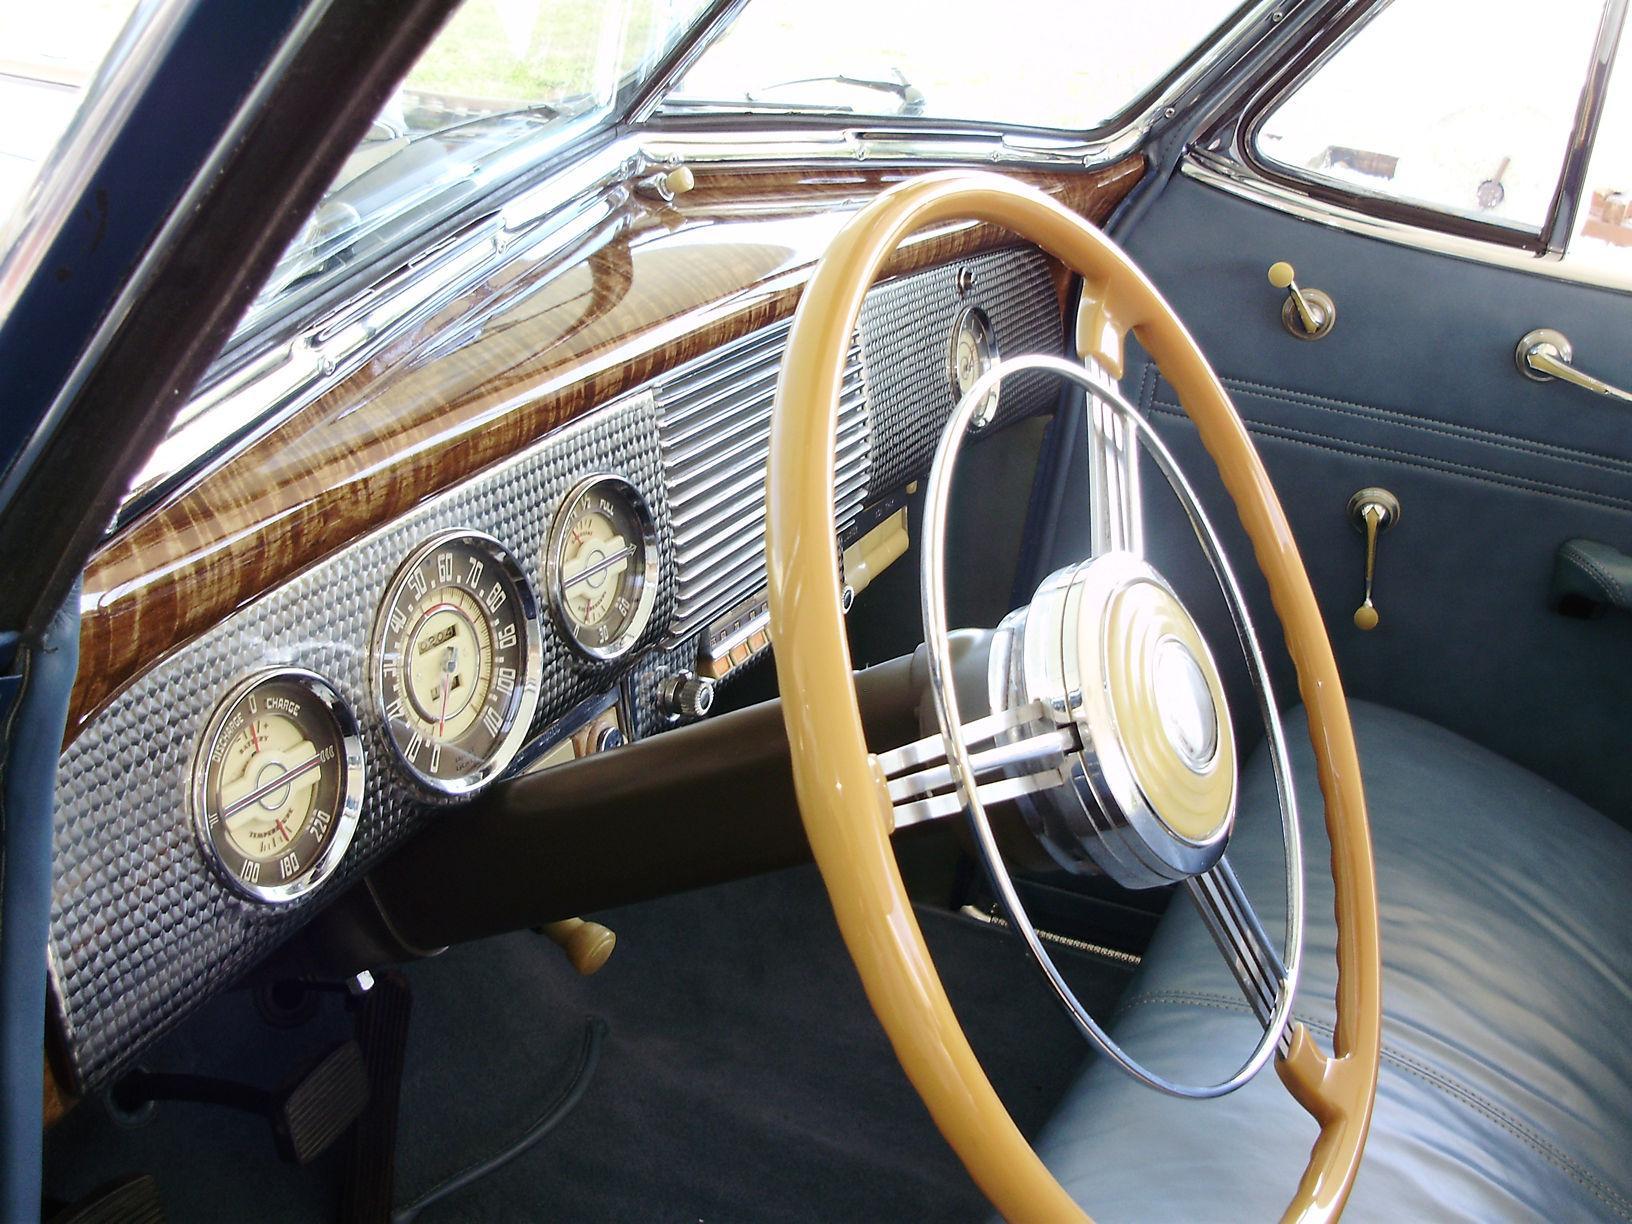 1940 BUICK CENTURY CONVERTIBLE SEDAN - Vintage Motors of Sarasota Inc. #27